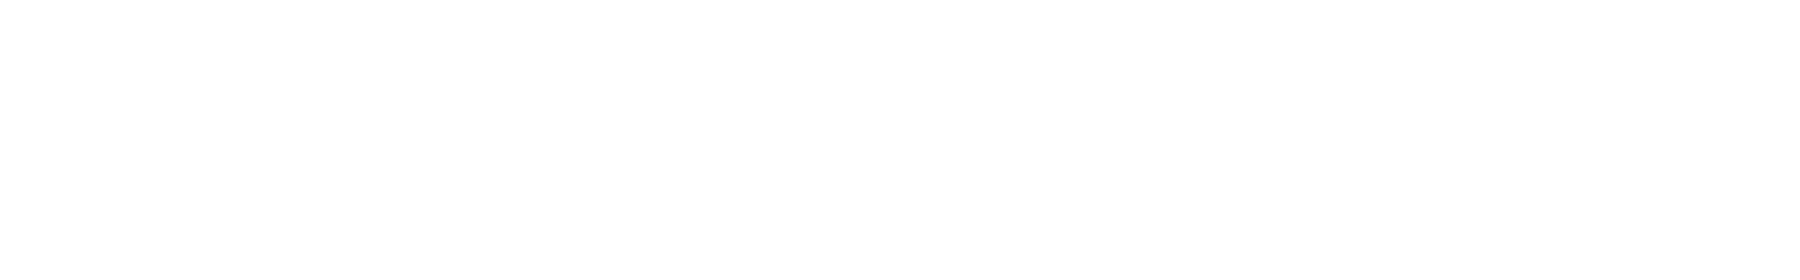 alvinspk34